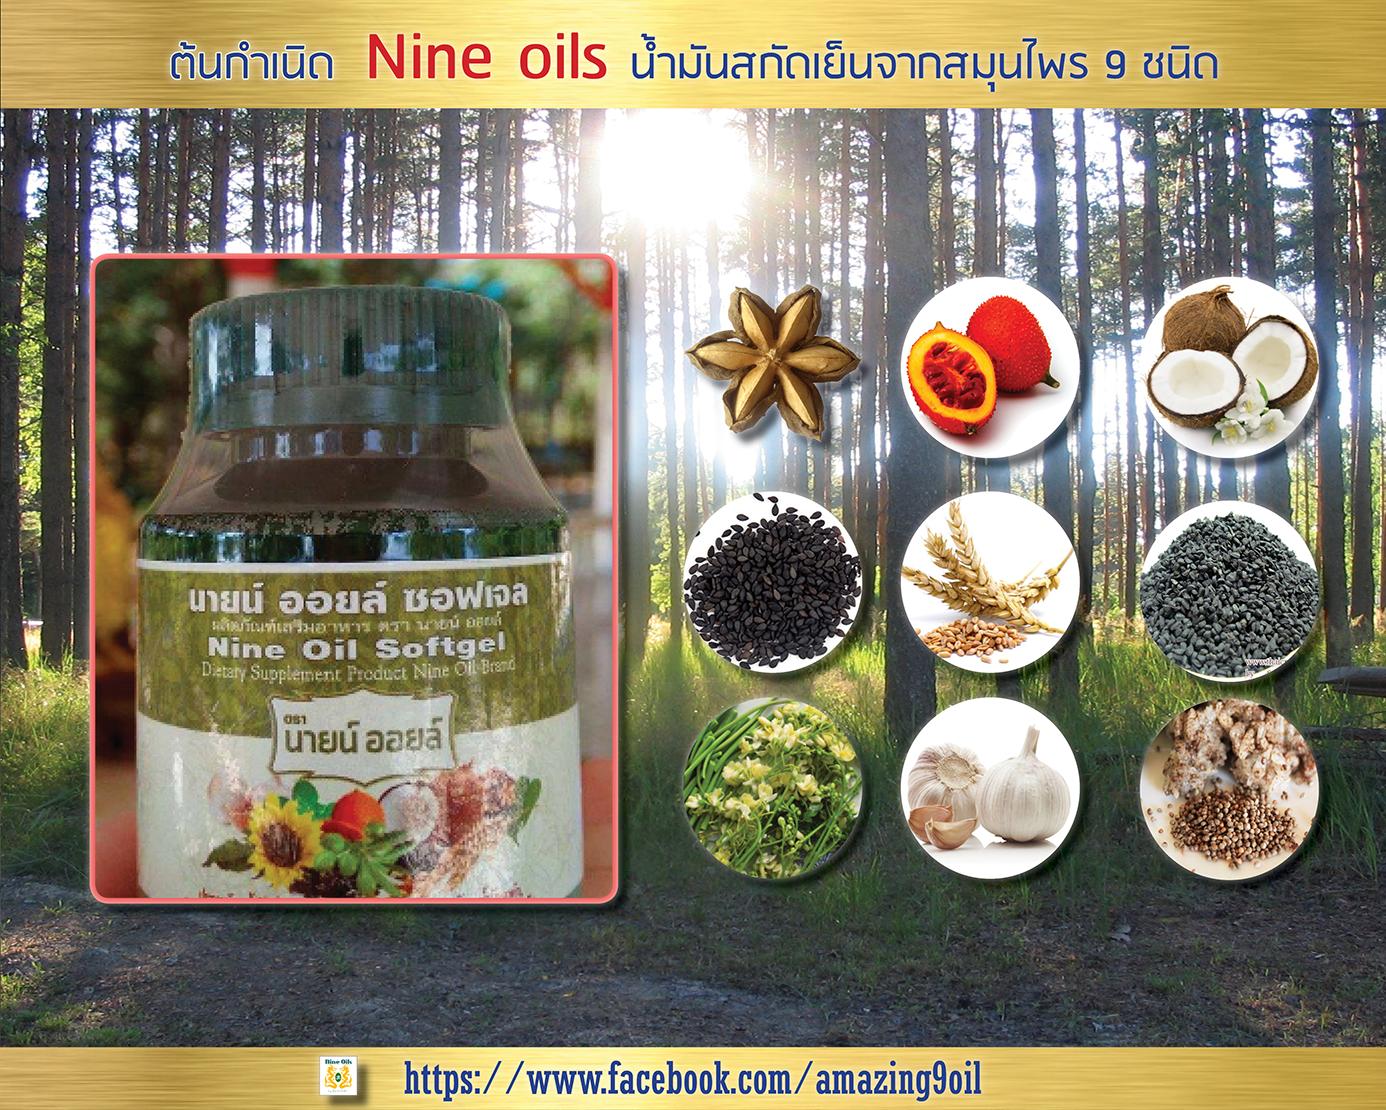 Amazing Nine-Oils (ต้นกำเนิด Nine-Oils)